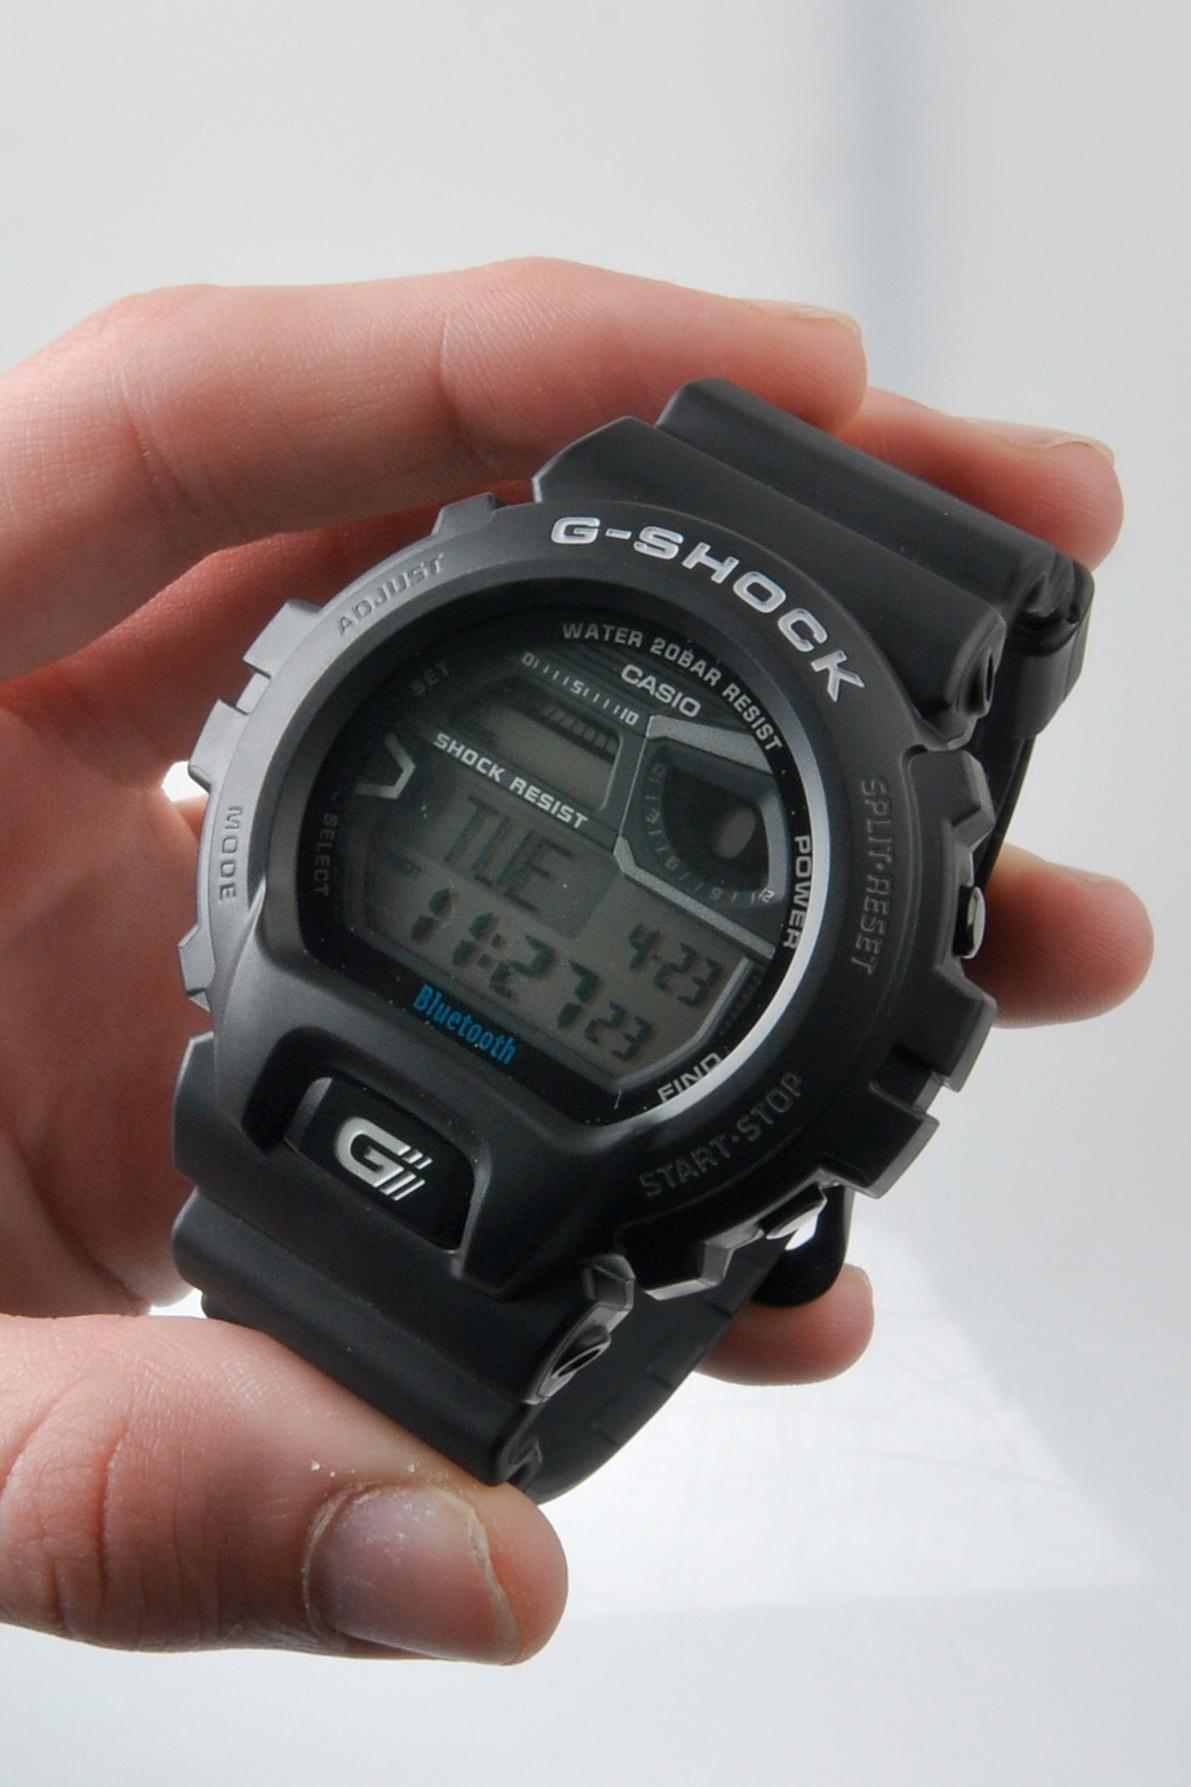 Casio G-Shock GB-6900AA. Foto: Sander Dyrop, Amobil.no